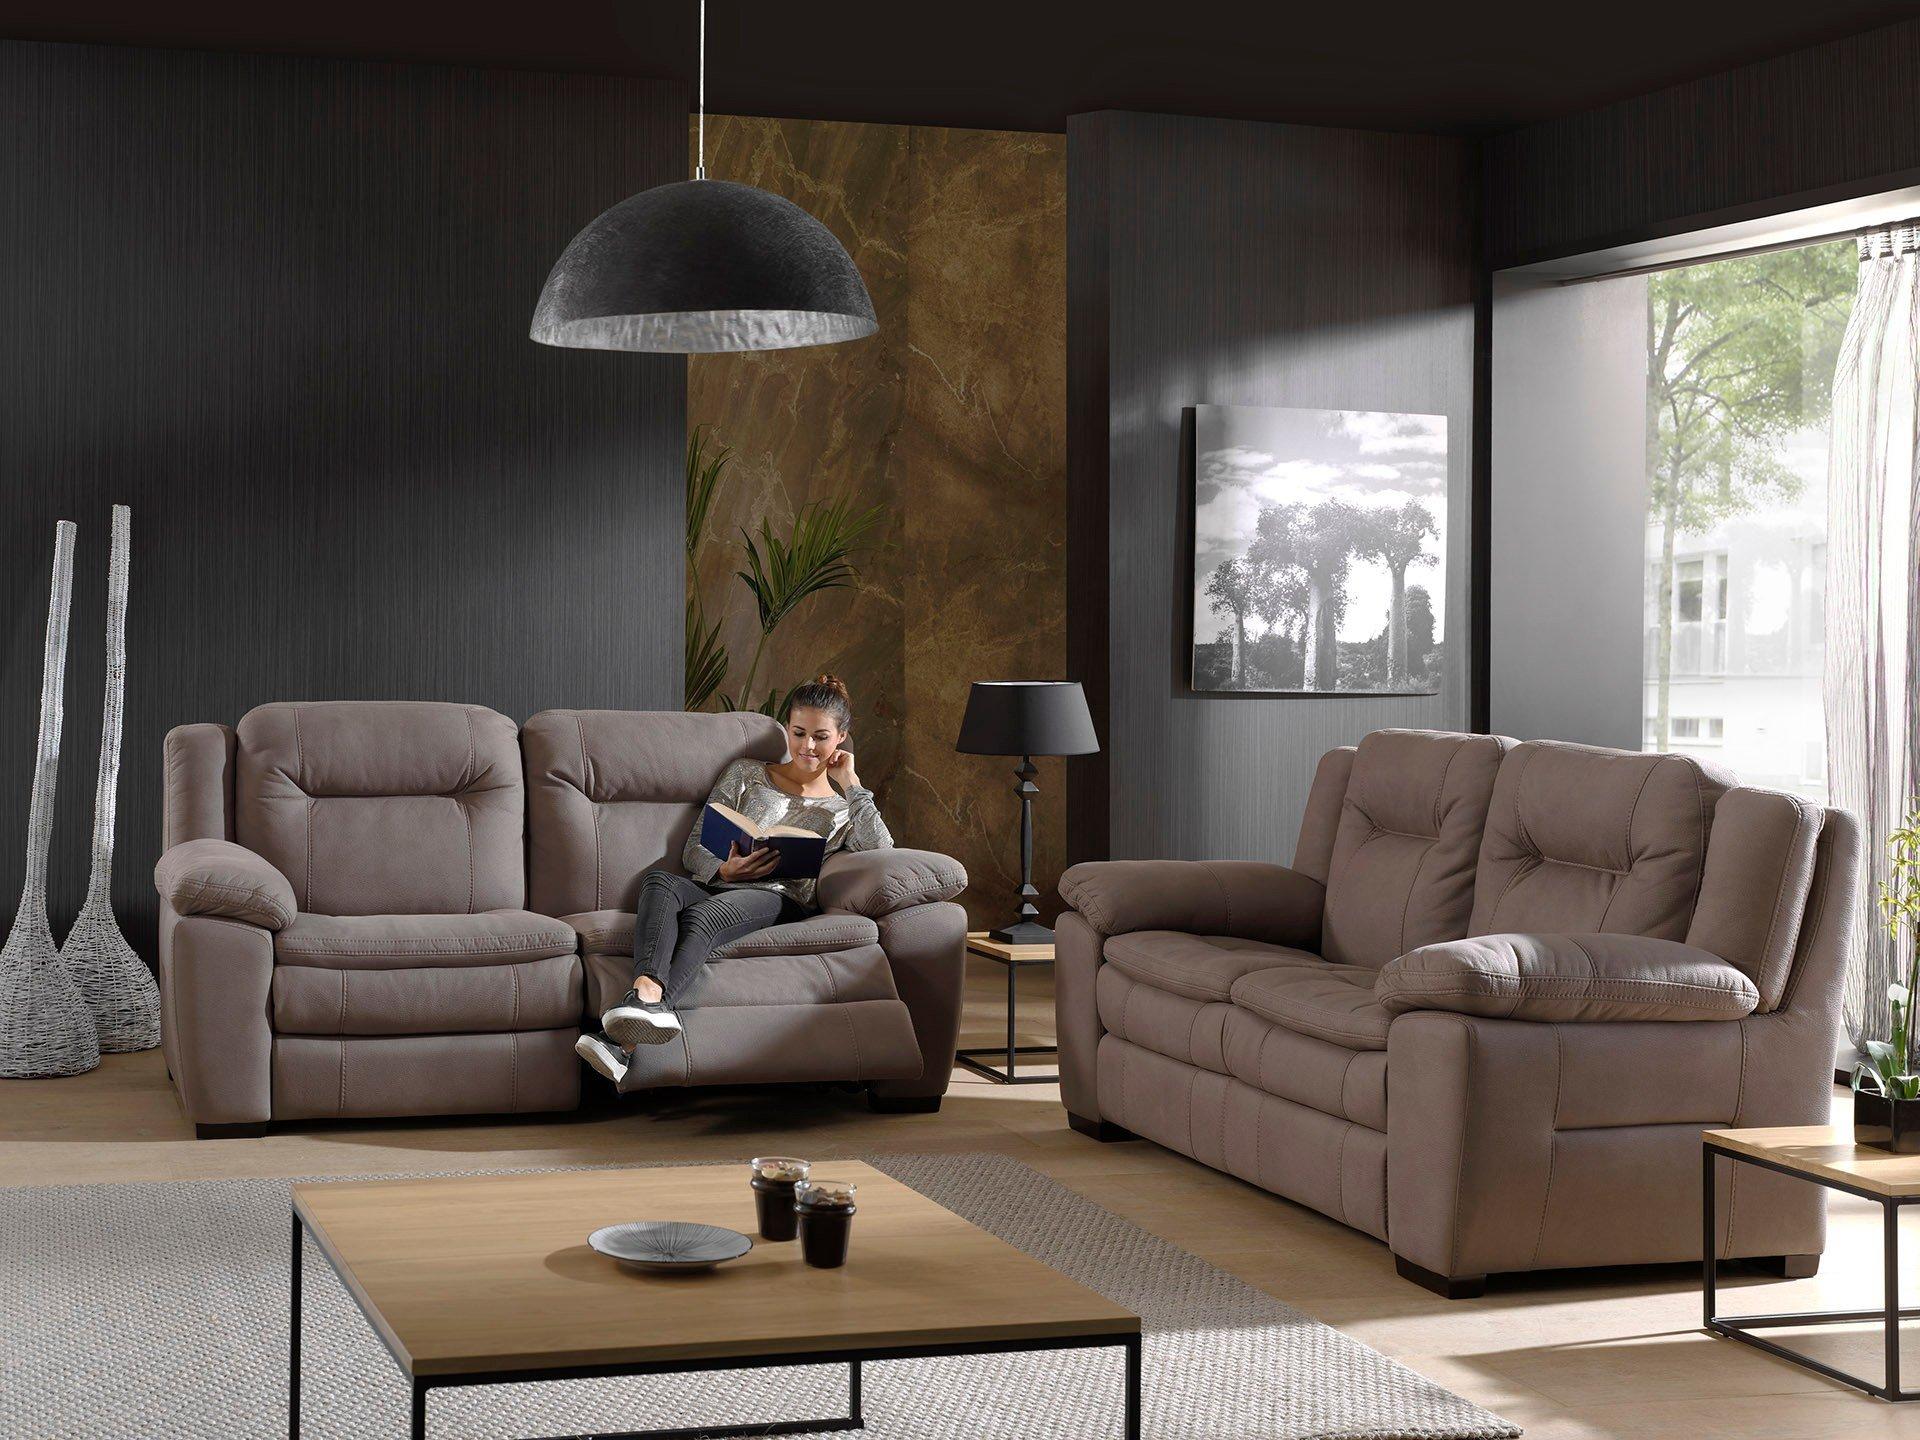 Bazinga Fixe Ou Relax Fabricants Reunis Meubles Decorations